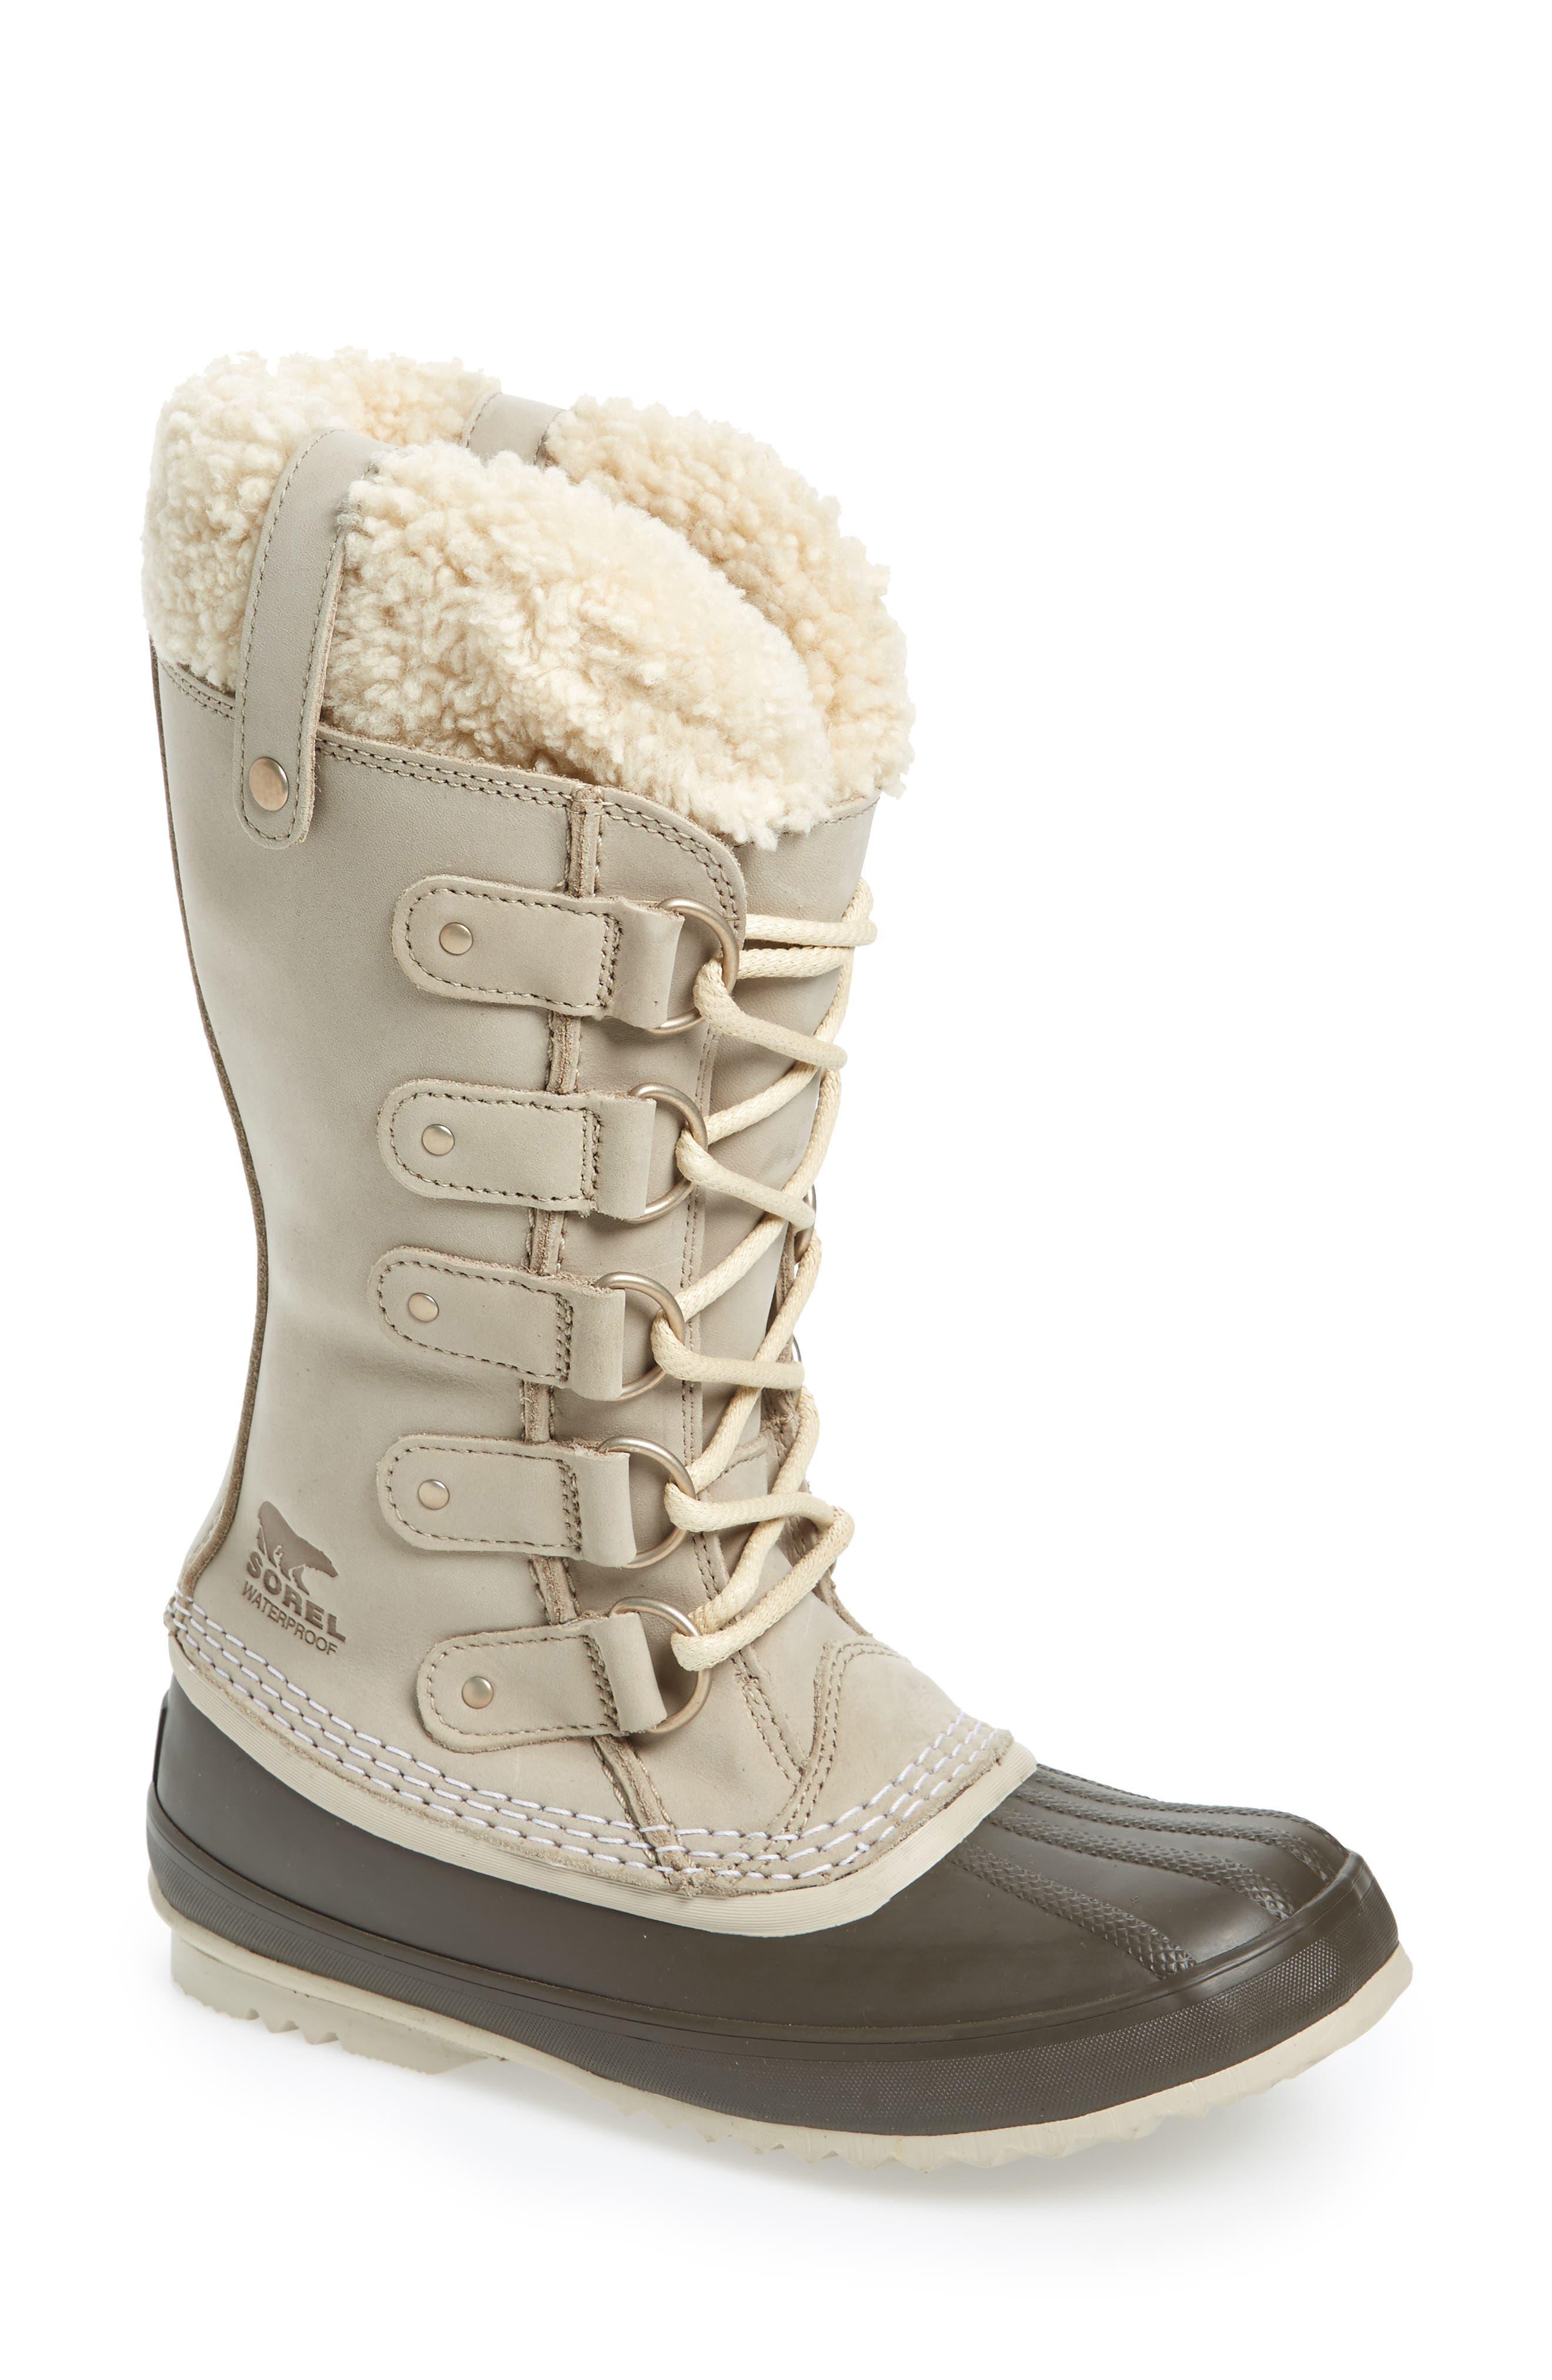 Sorel Joan of Arctic™ Lux Waterproof Winter Boot with Faux-Fur Cuff